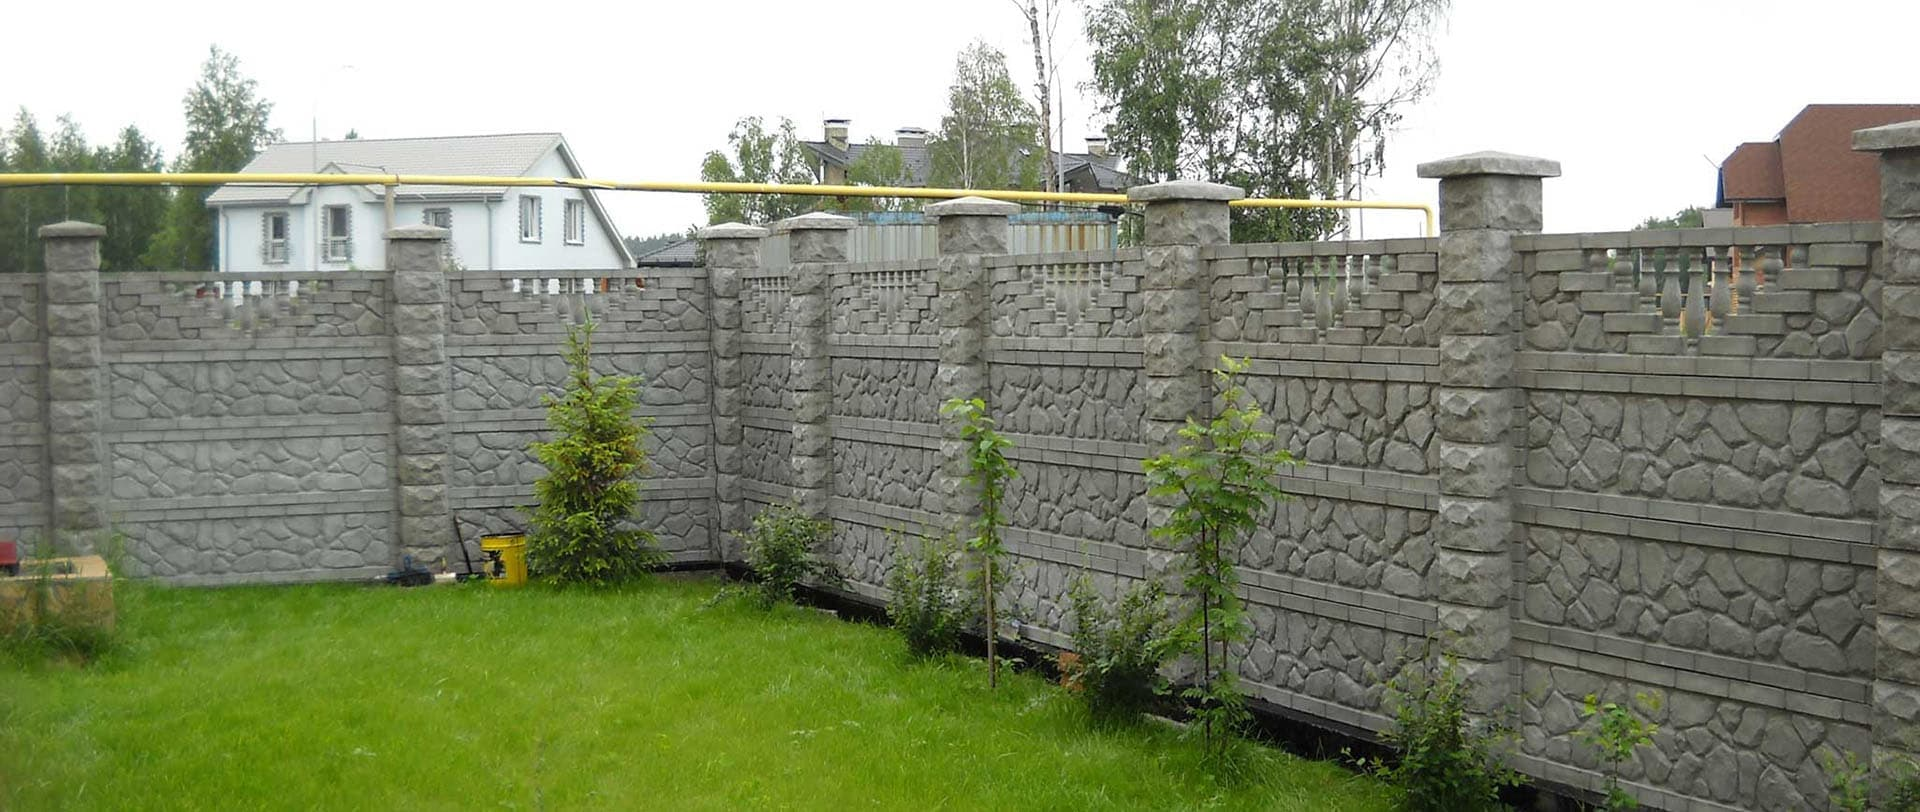 бетонные заборы